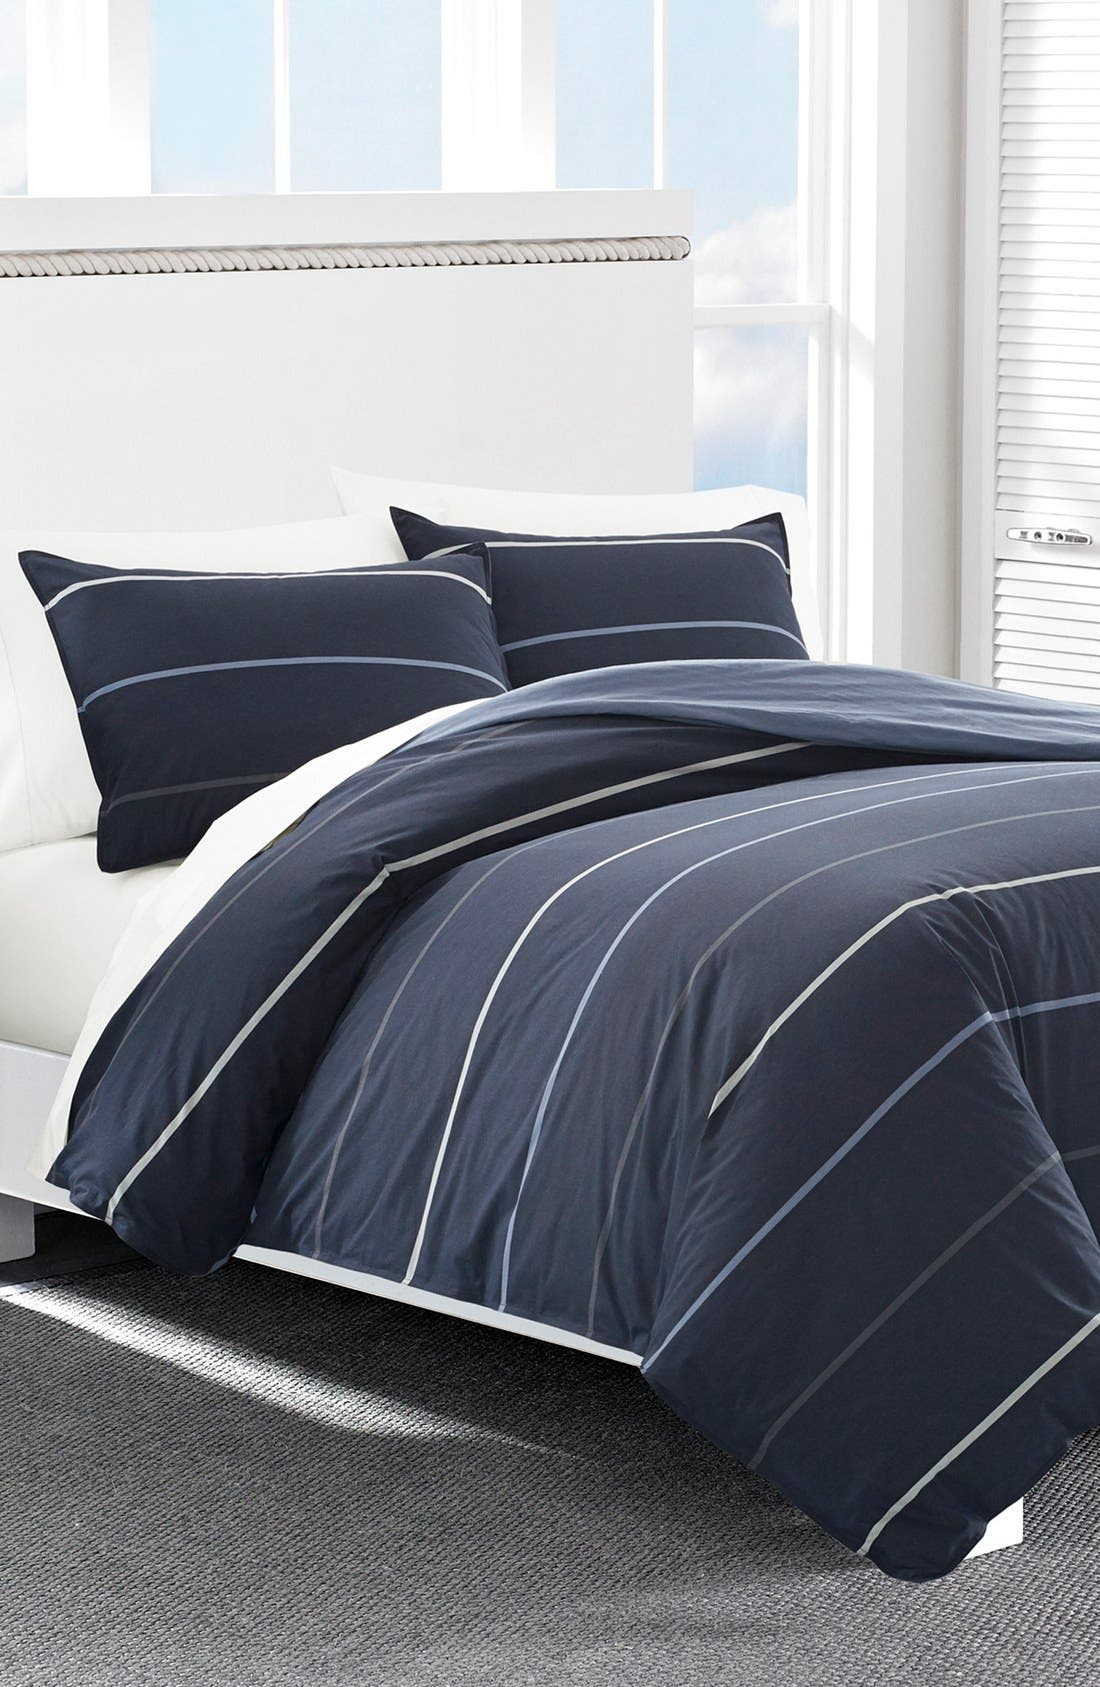 Main Image - Nautica Southport Comforter & Sham Set